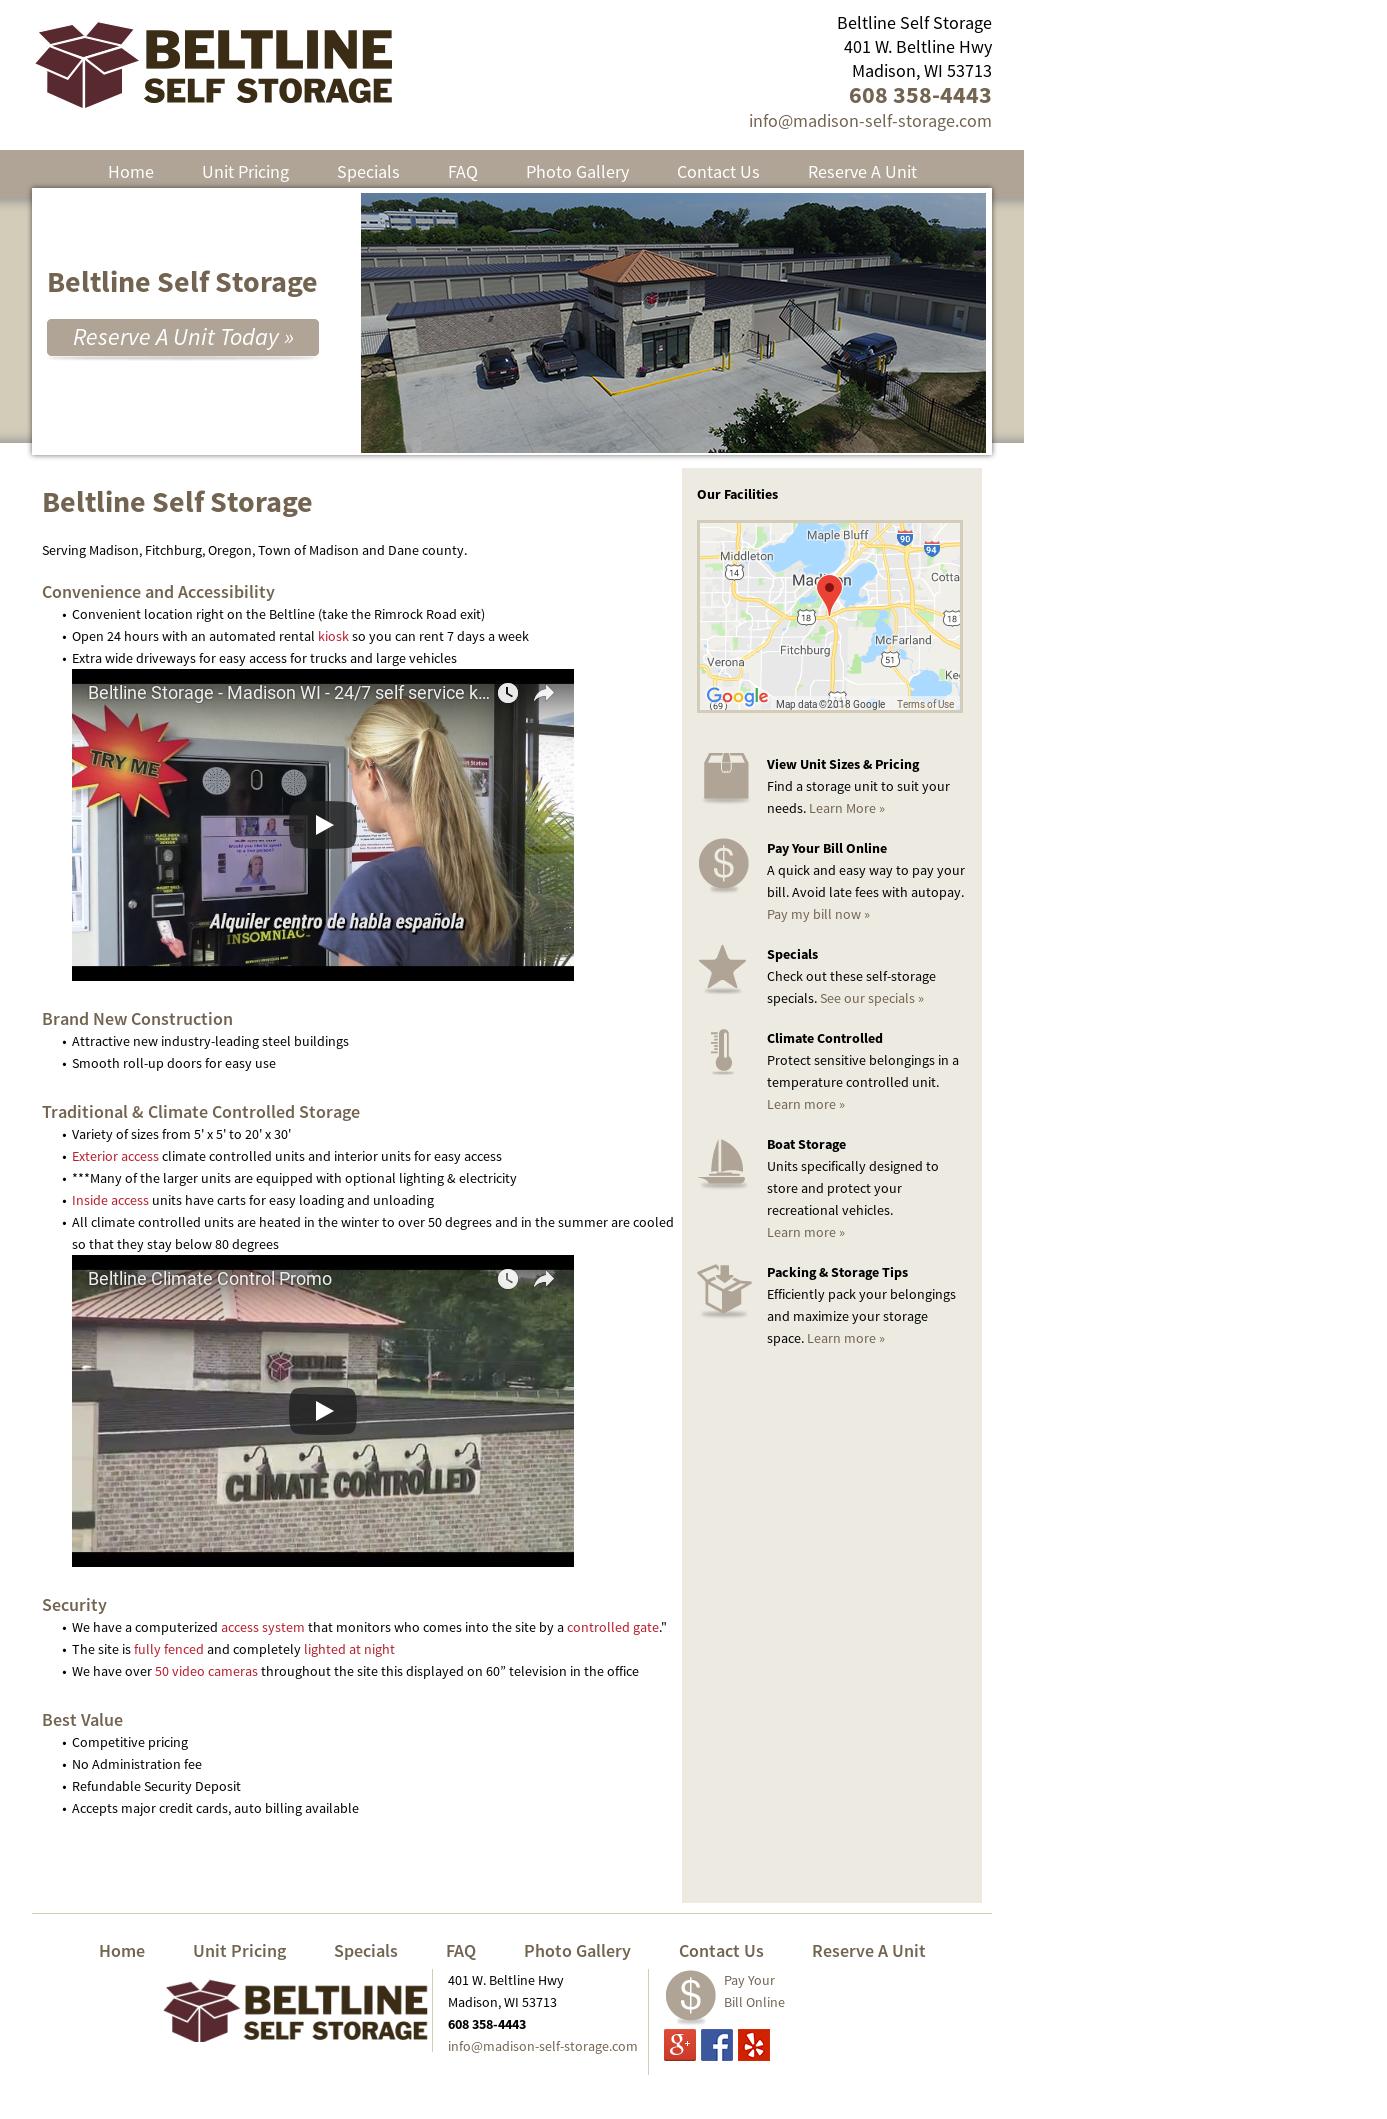 Beltline Self Storage Website History